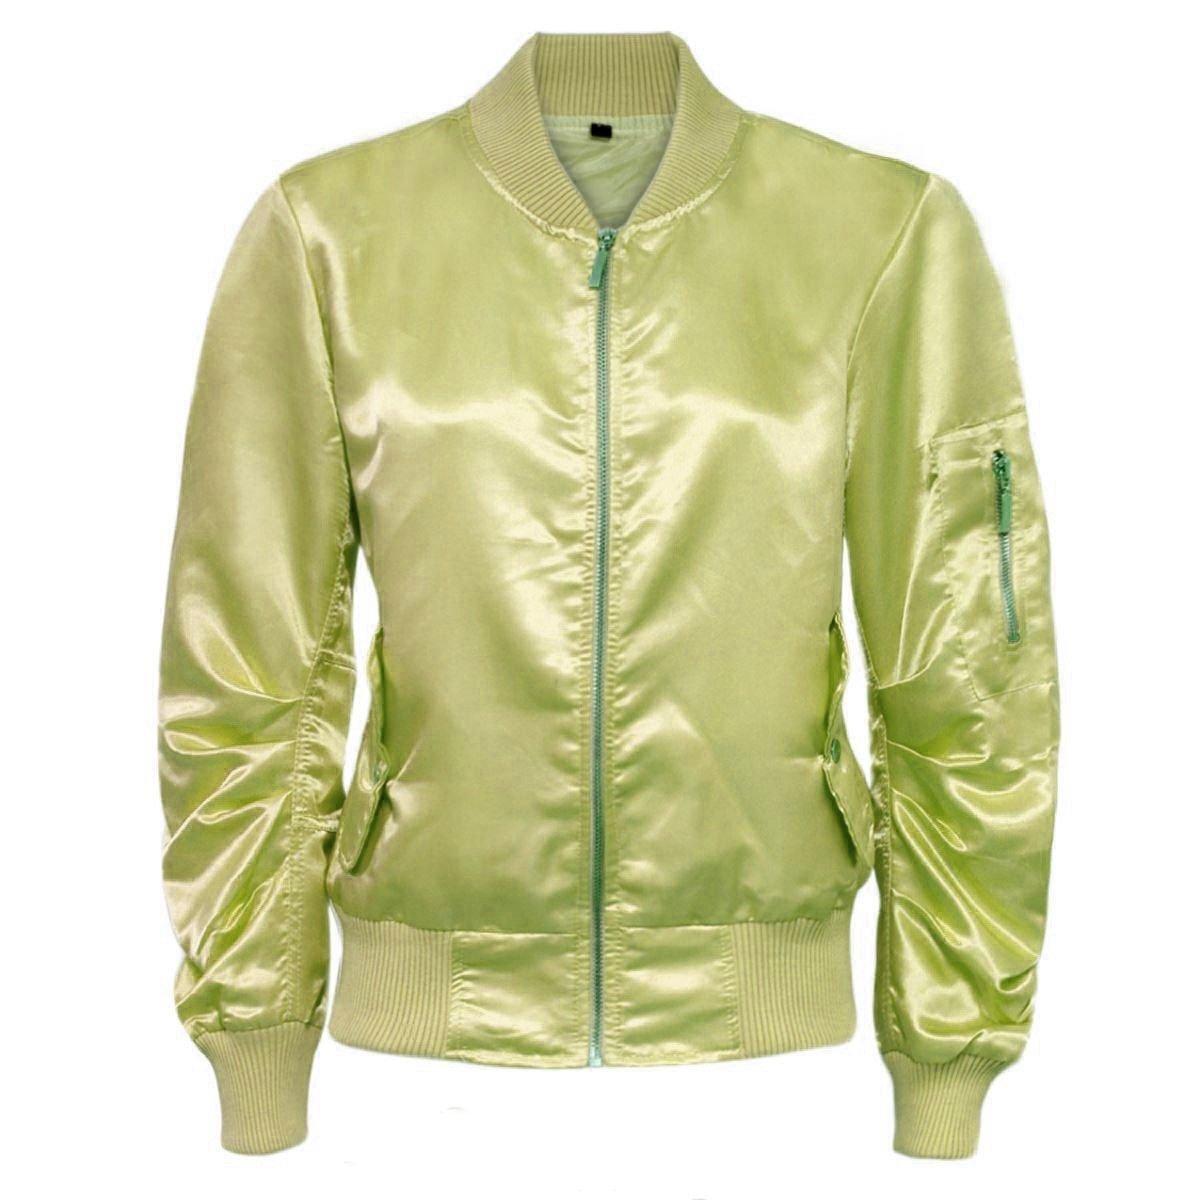 Womens Ladies Satin Plain MA1 Retro Army Flight Vintage Biker Bomber Jacket